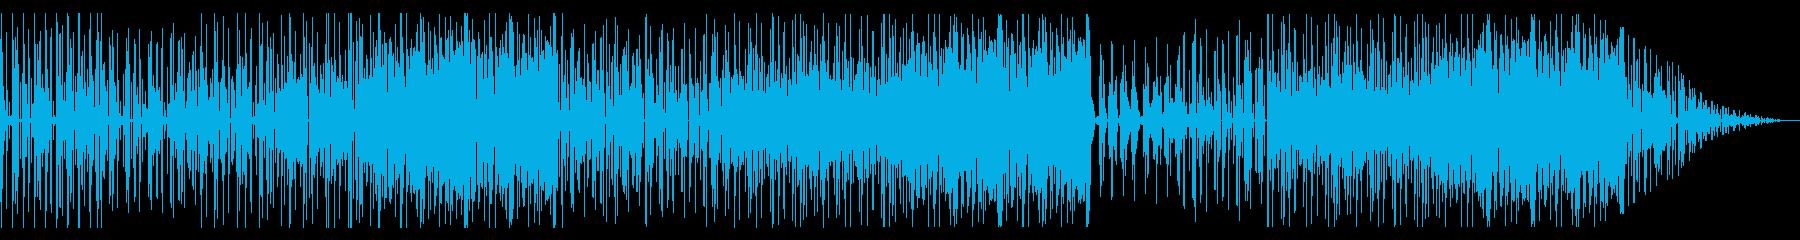 HIPHOPトラック/スクラッチが特徴的の再生済みの波形